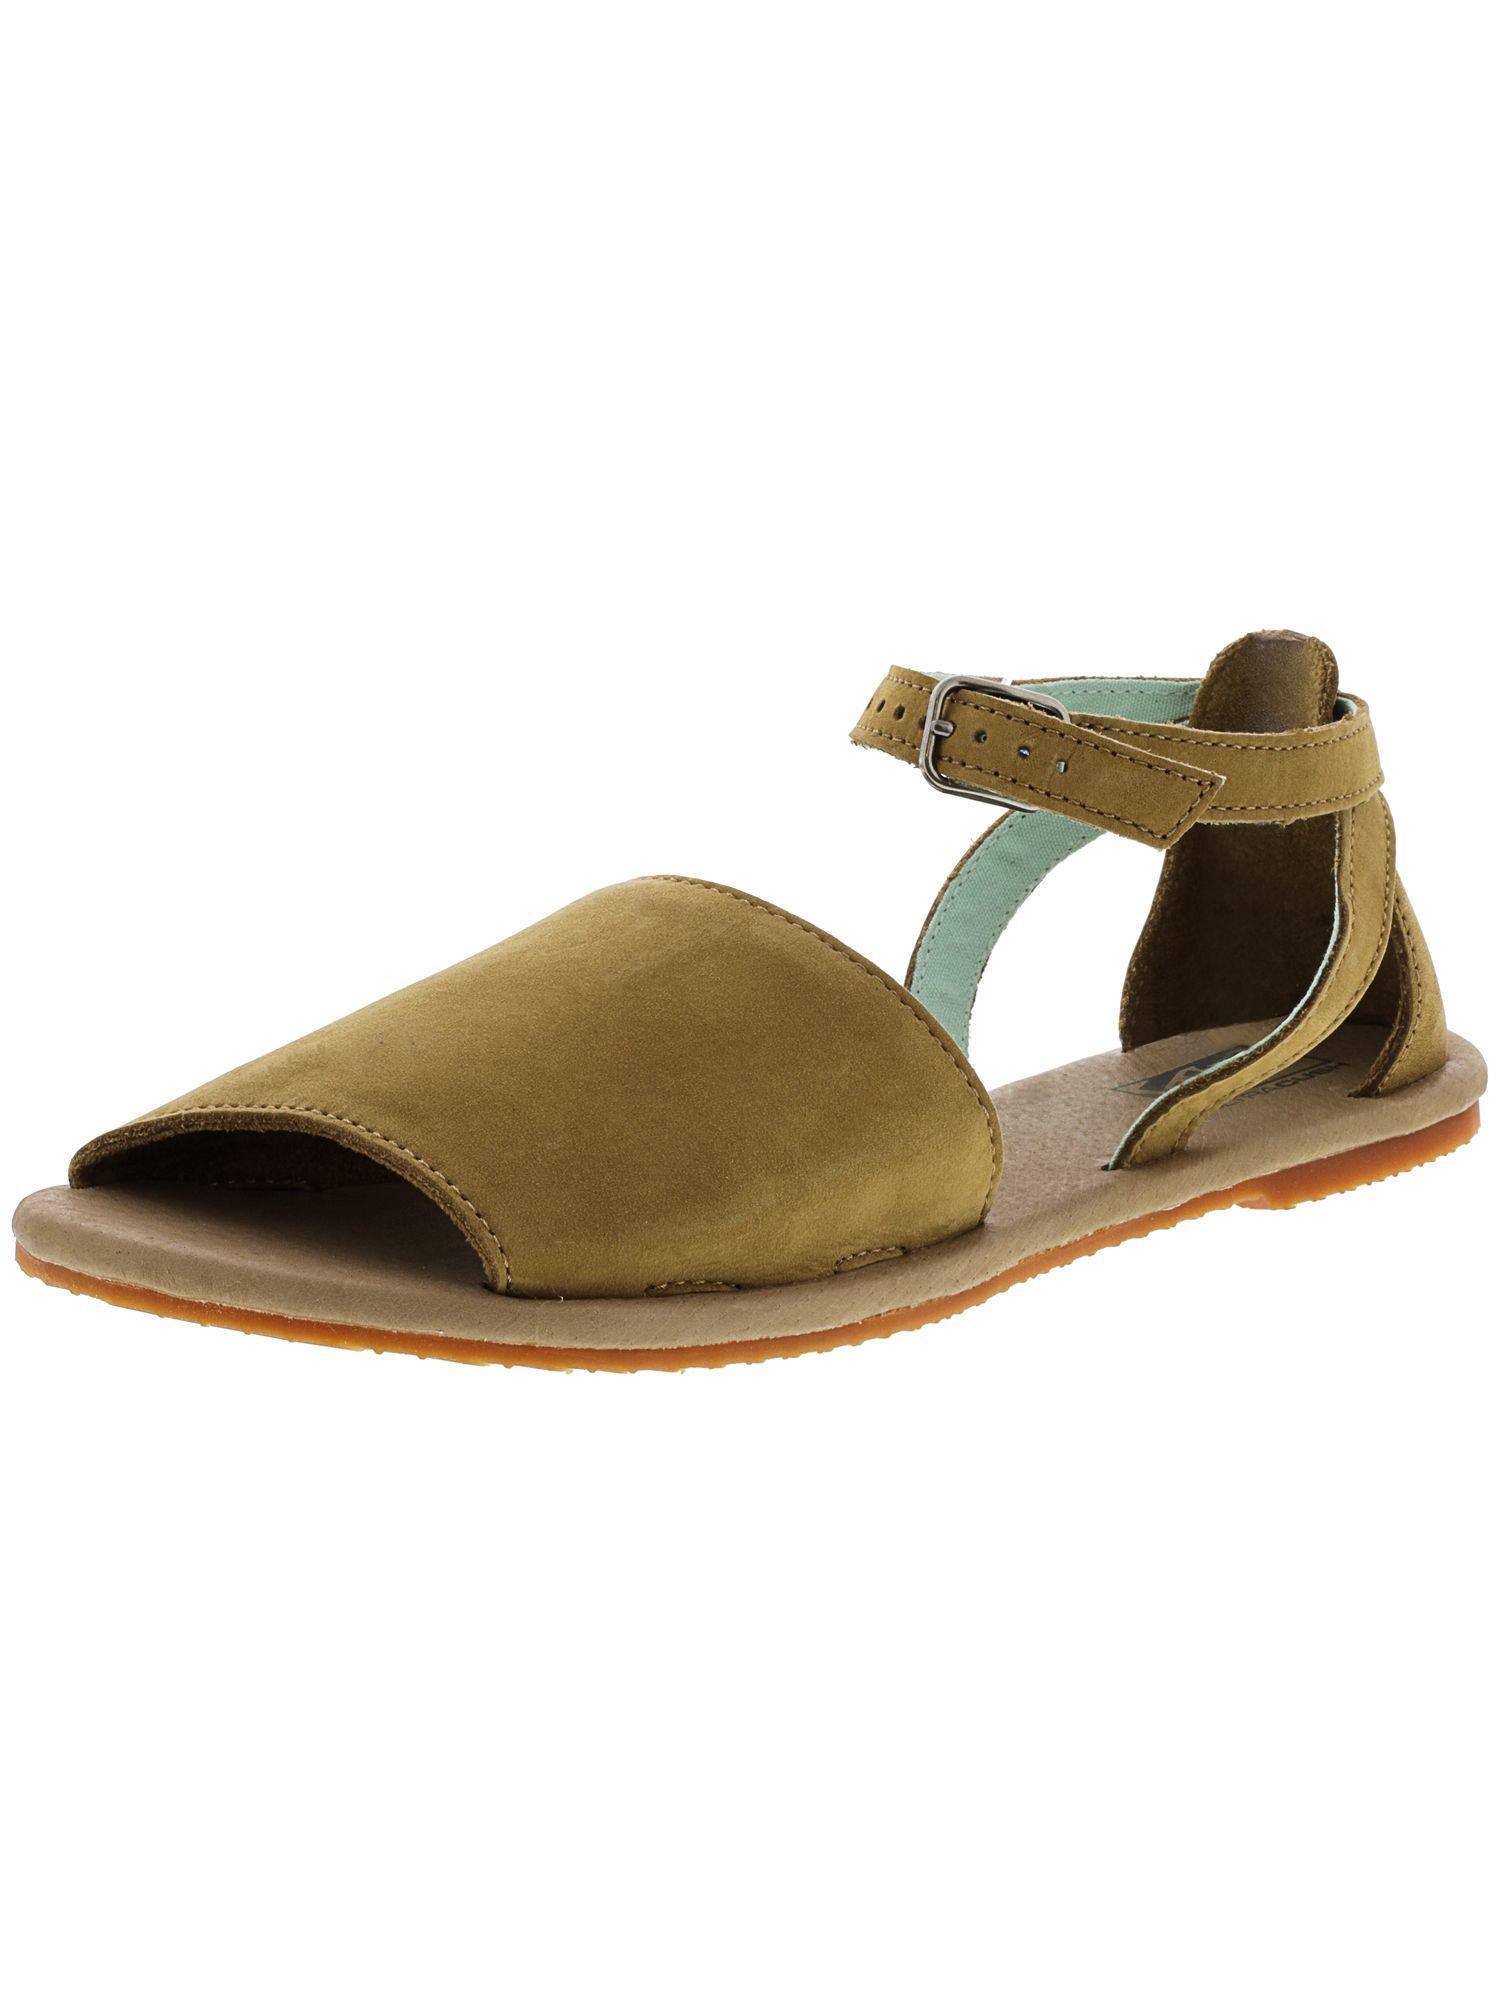 Lyst - Vans Women s Ankle-hi Tan Lizard Sandal - 10m in Brown f750f5097